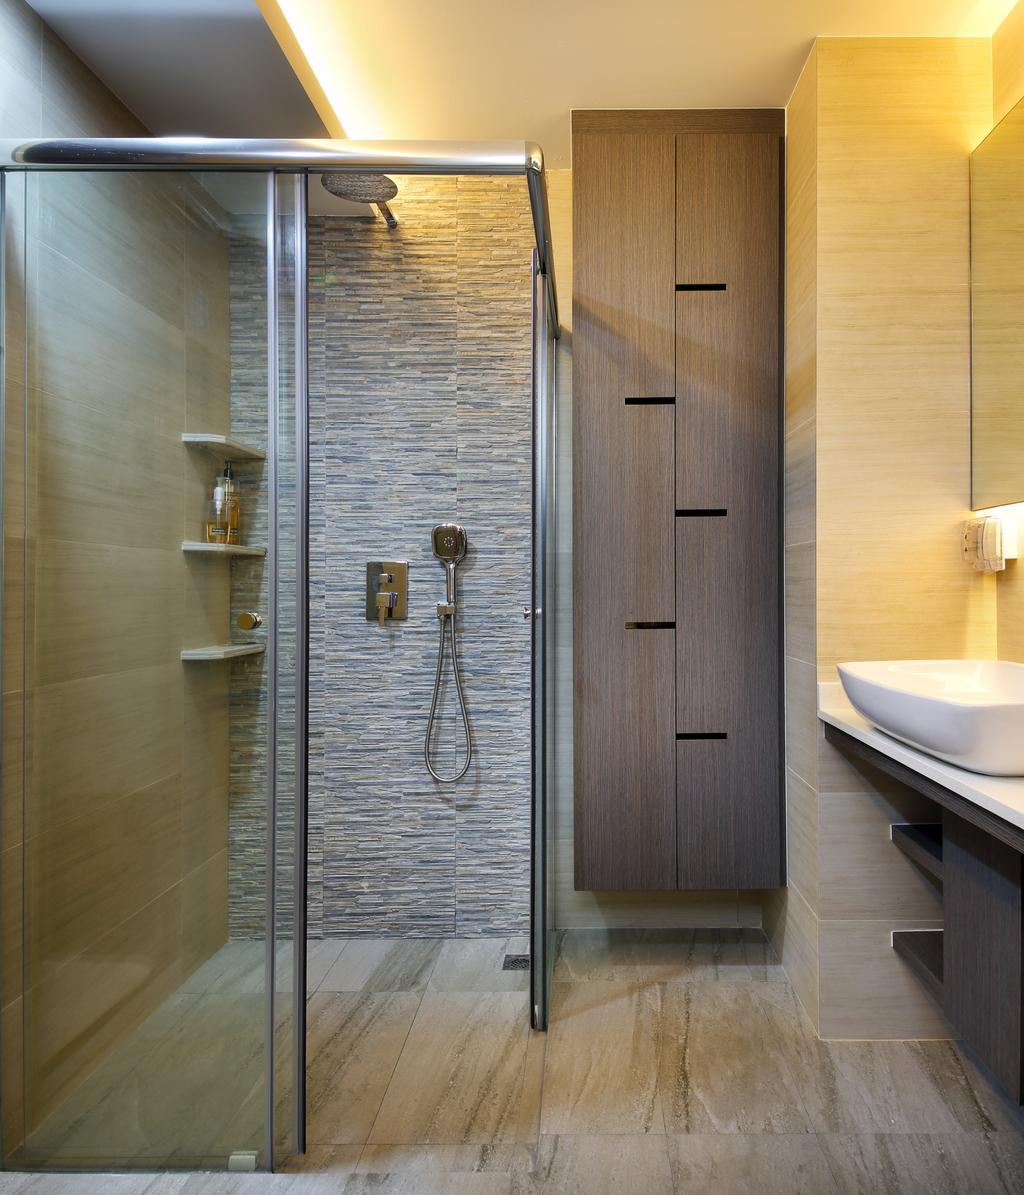 Contemporary, Condo, Bathroom, Parc Oasis, Interior Designer, Urban Design House, Grey Wooden Floor, Marble Wall, Wooden Wadrobe, Sink, Wooden Floor, Resort Theme, Sliding Glass Shower Door